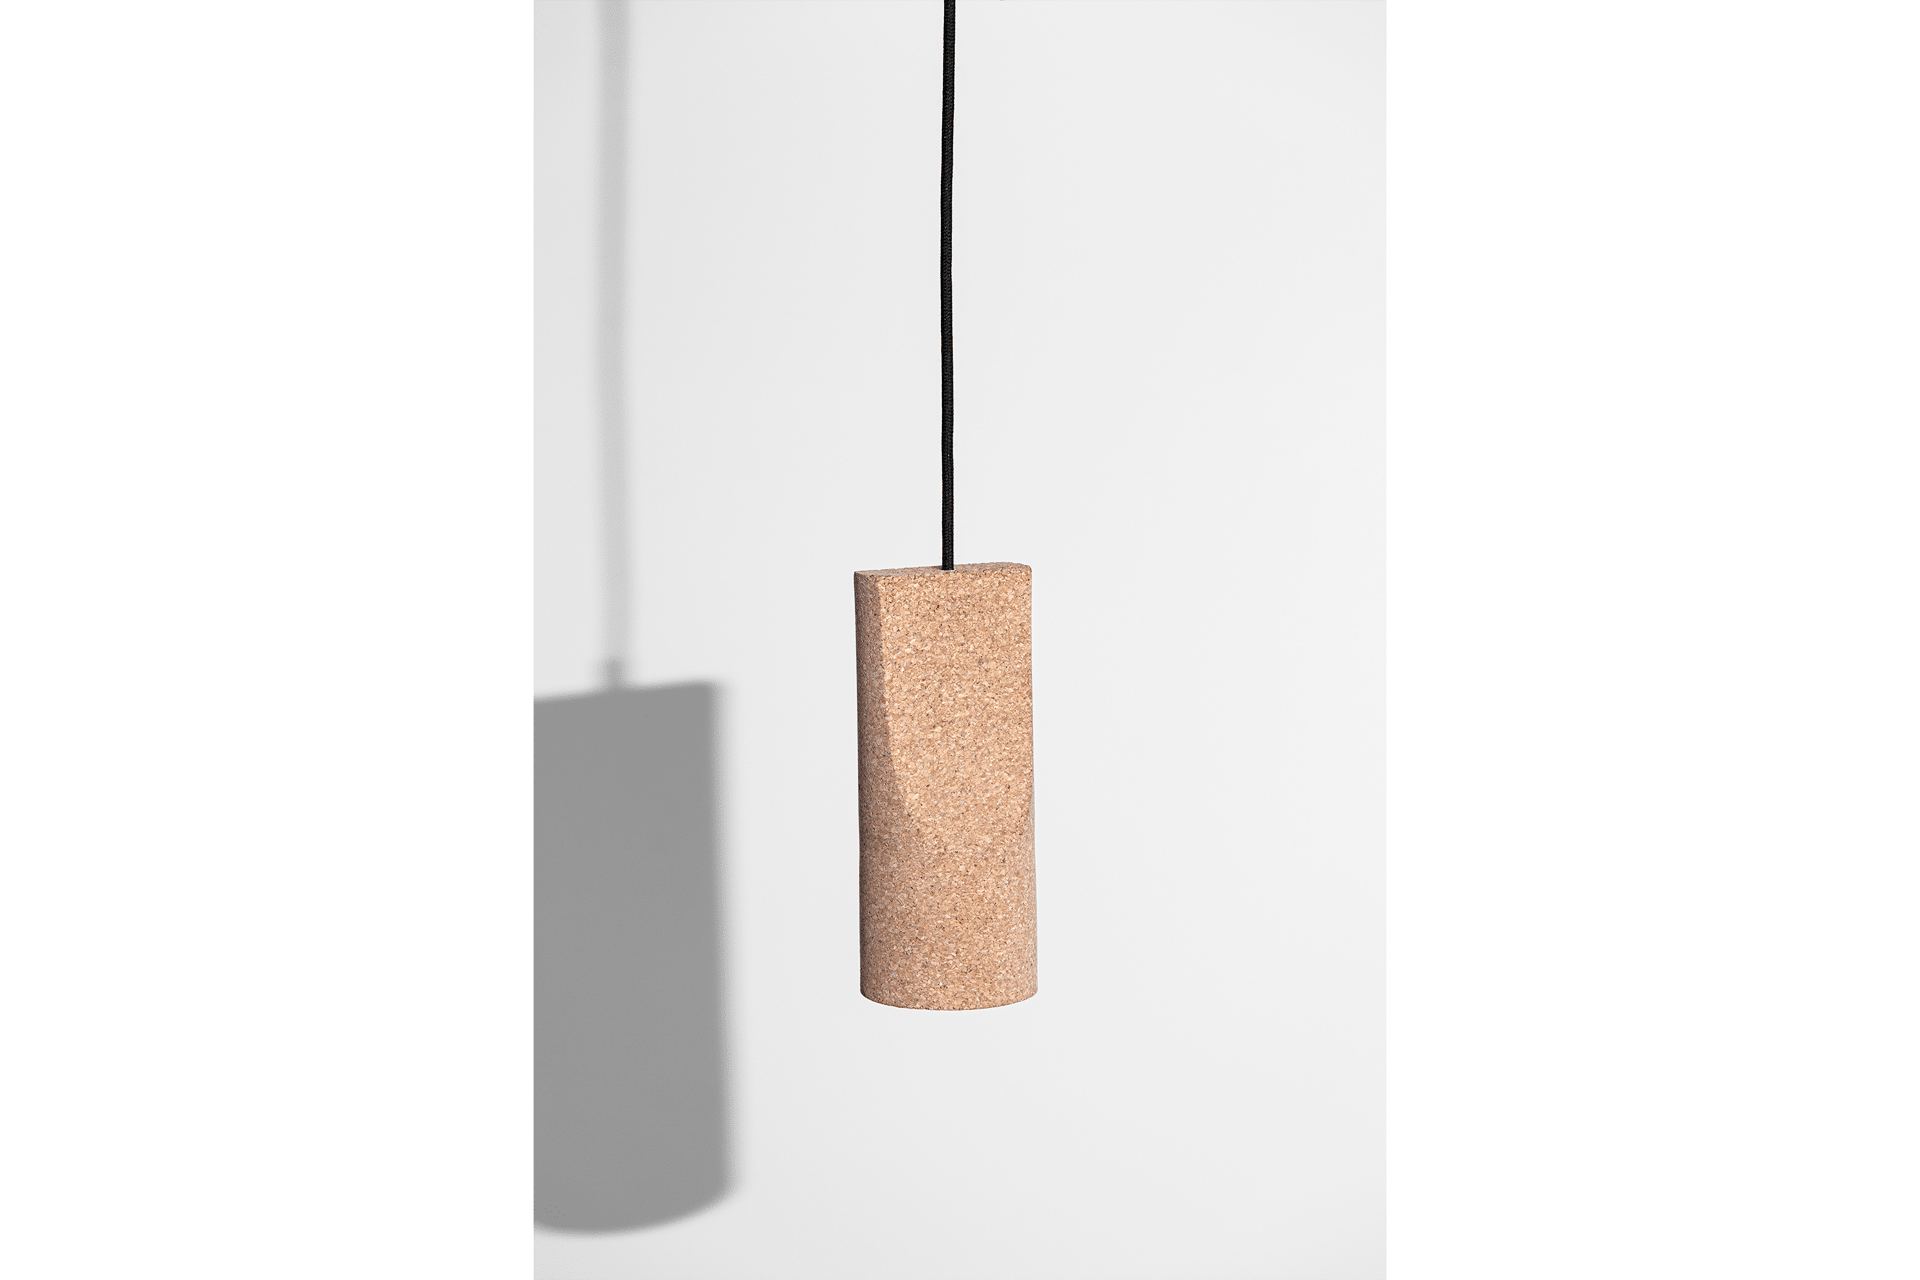 Cork Lamp - Miguel Soeiro